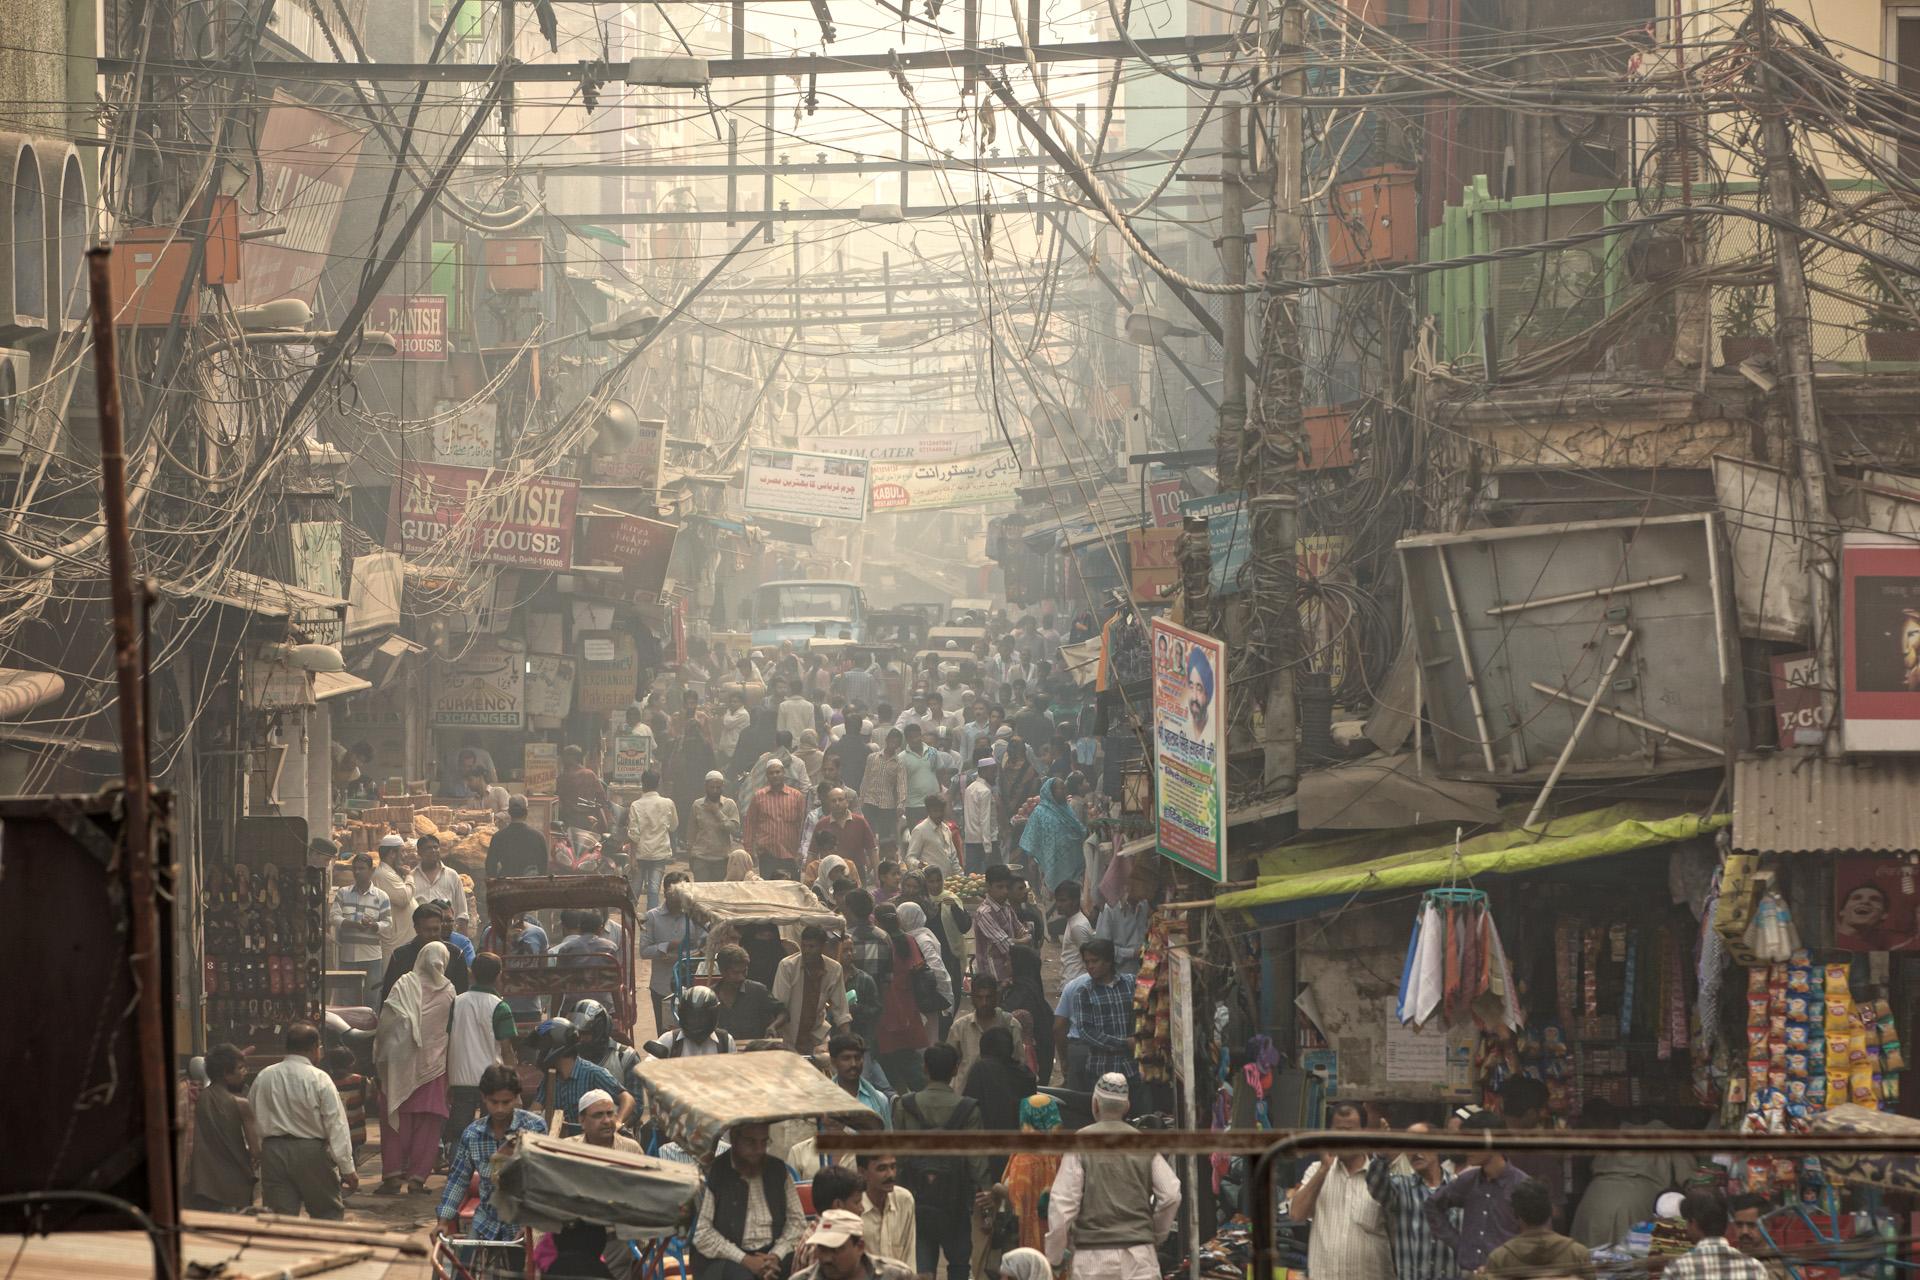 India-Travel-Old-Delhi-Street-1.jpeg